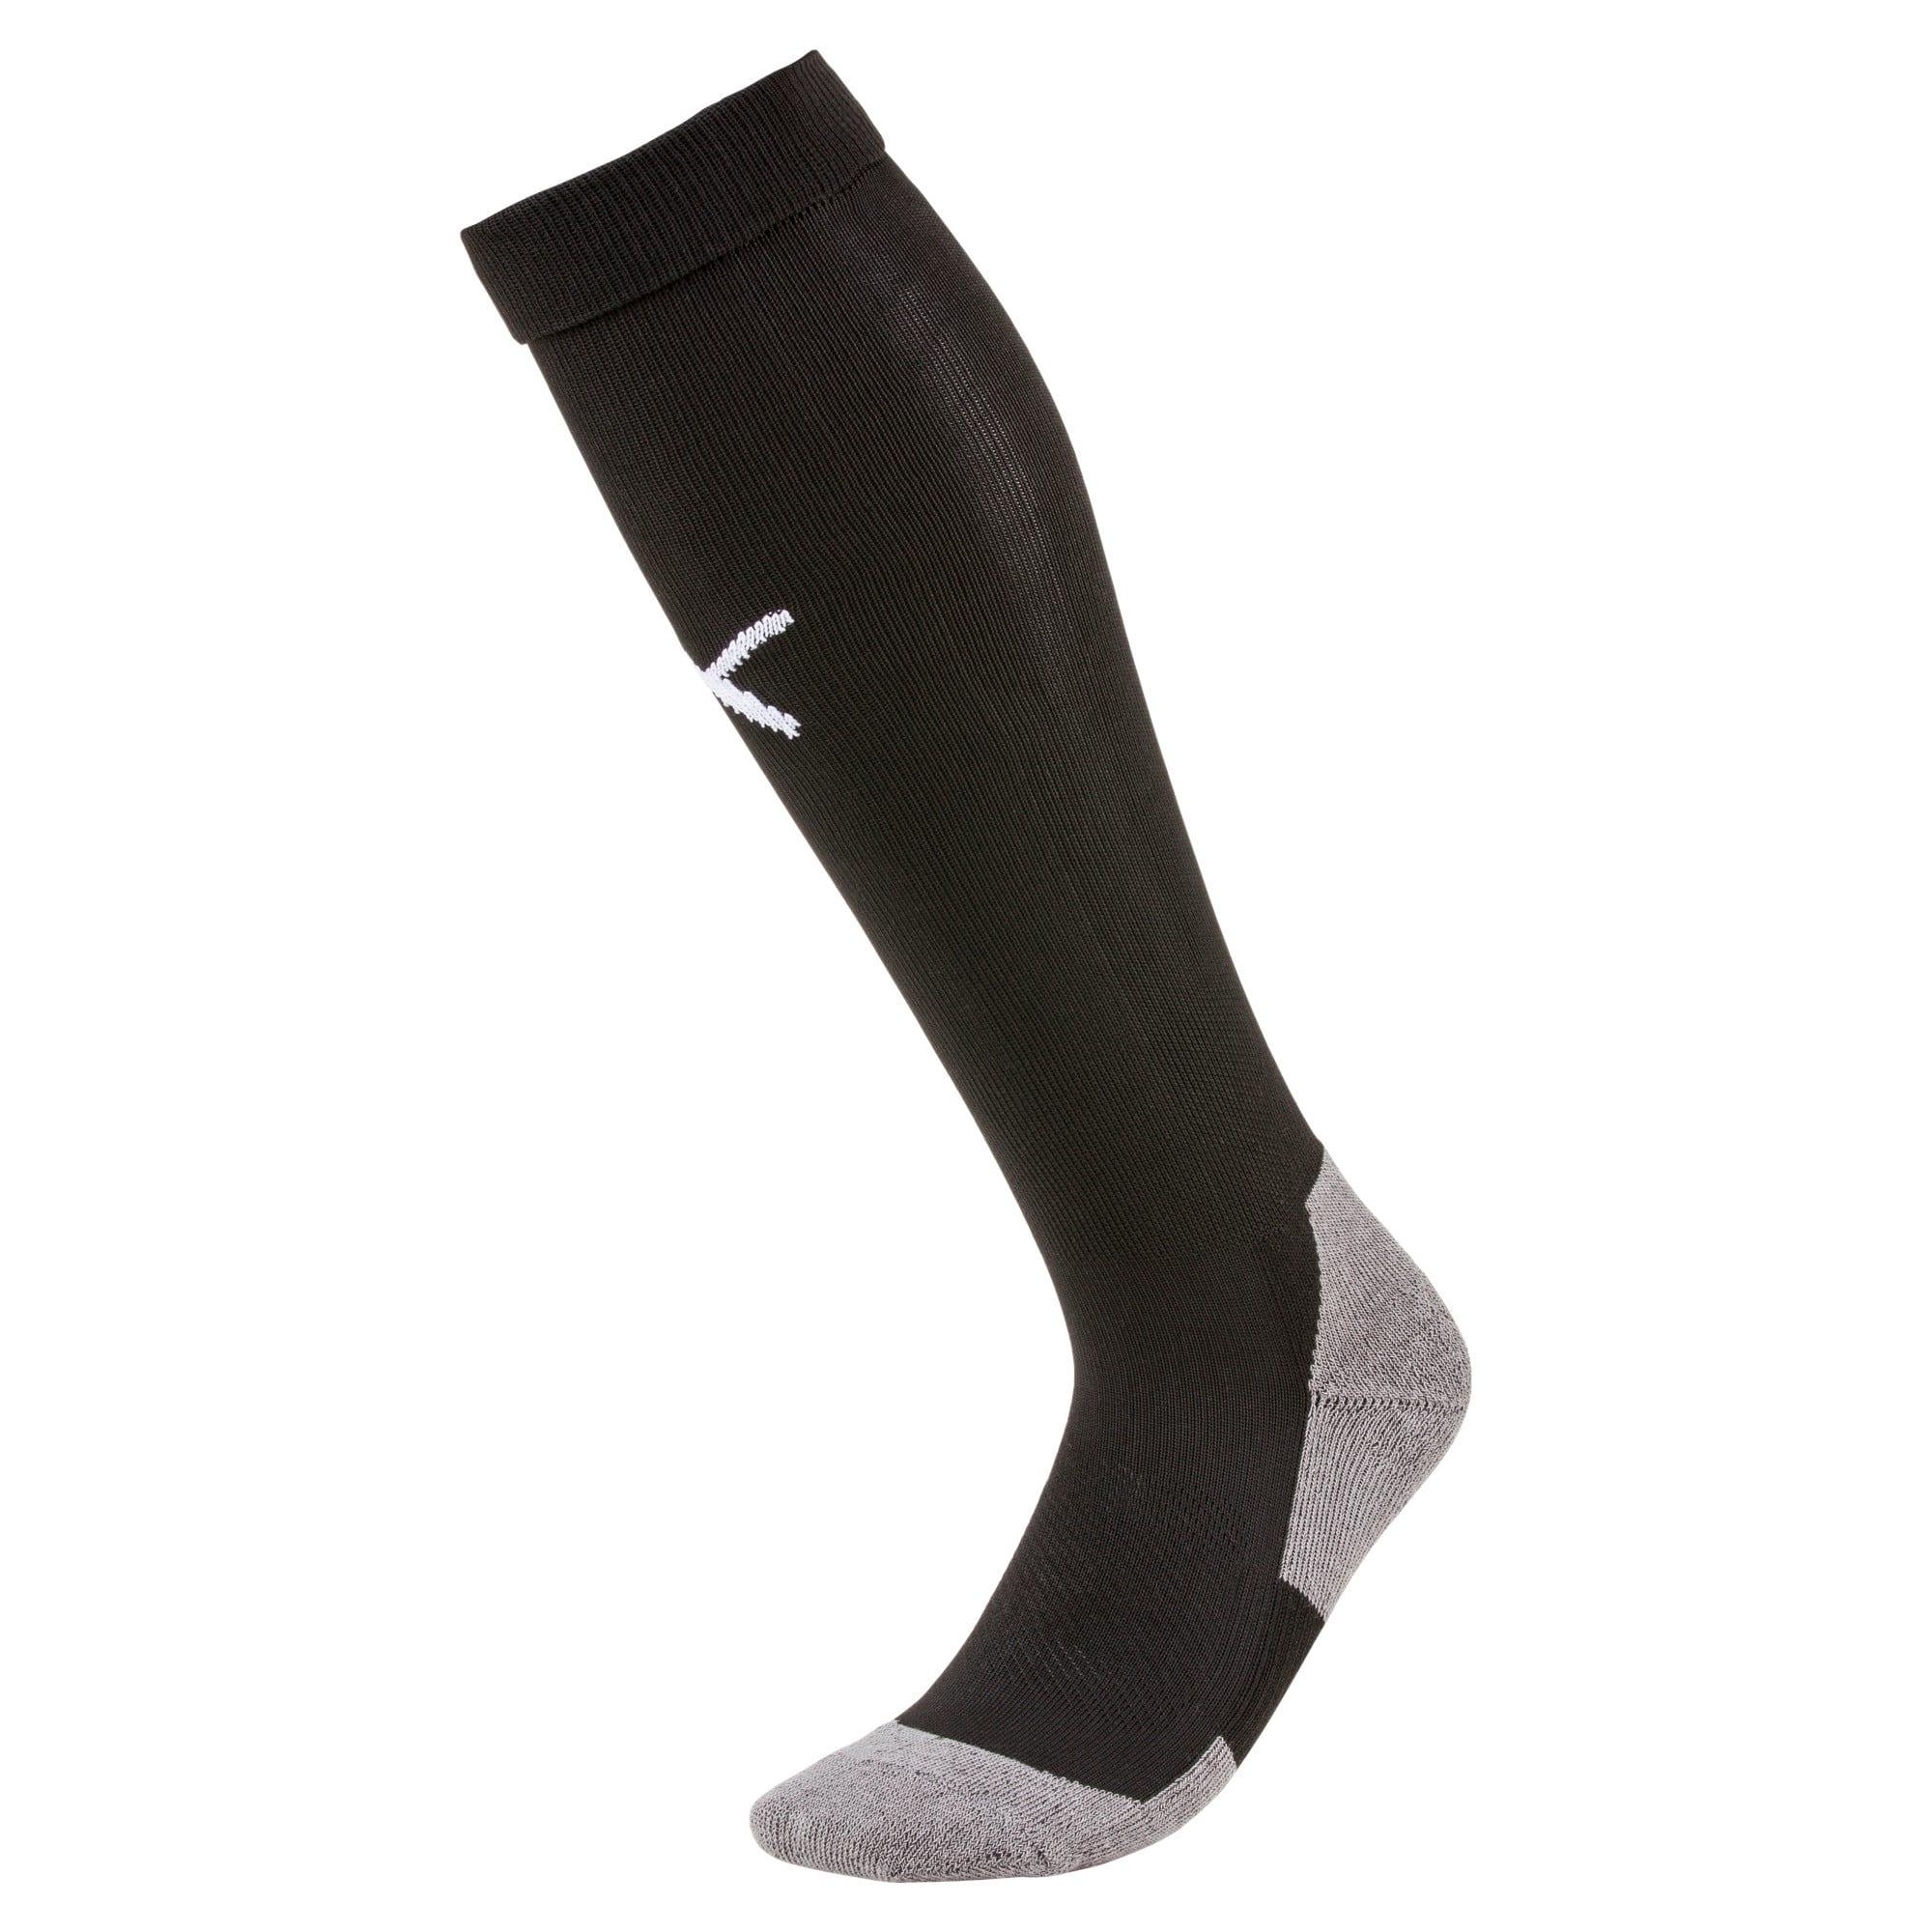 Thumbnail 1 of Football Men's LIGA Core Socks, Puma Black-Puma White, medium